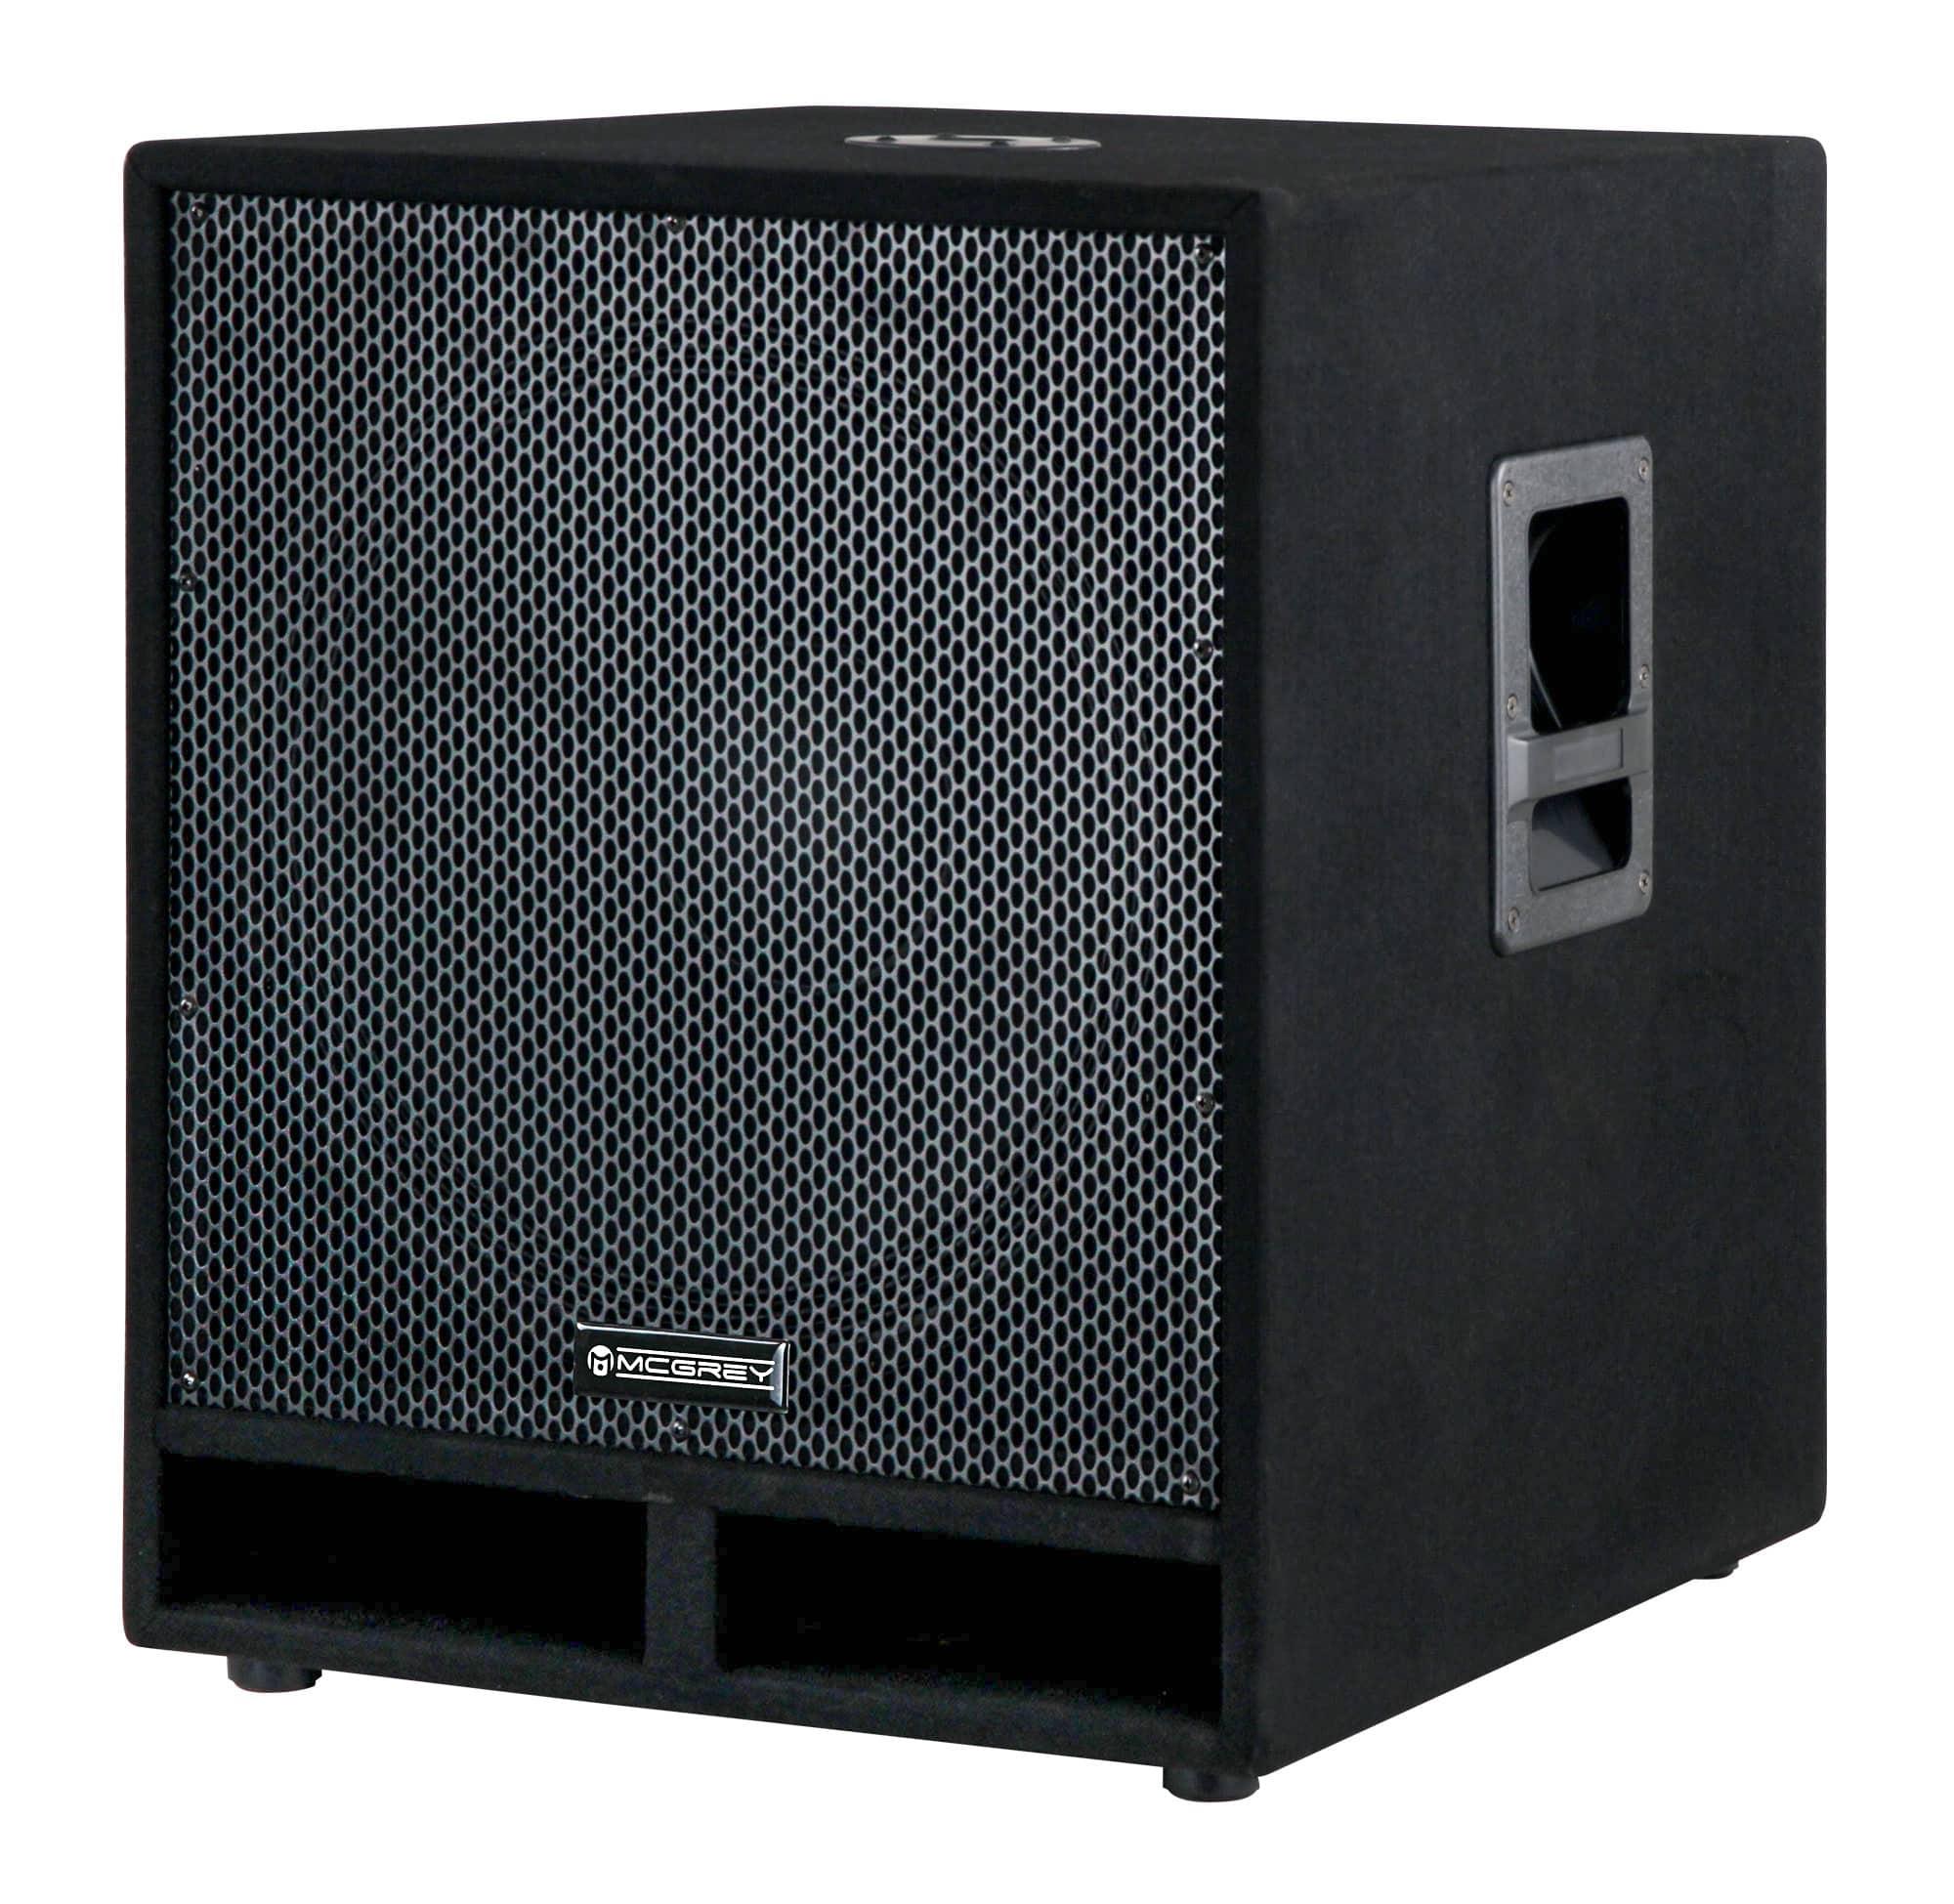 Paendstufen - McGrey PAS 118 18' passiver PA Subwoofer Bass Lautsprecher Box 1800 Watt Retoure (Zustand gut) - Onlineshop Musikhaus Kirstein